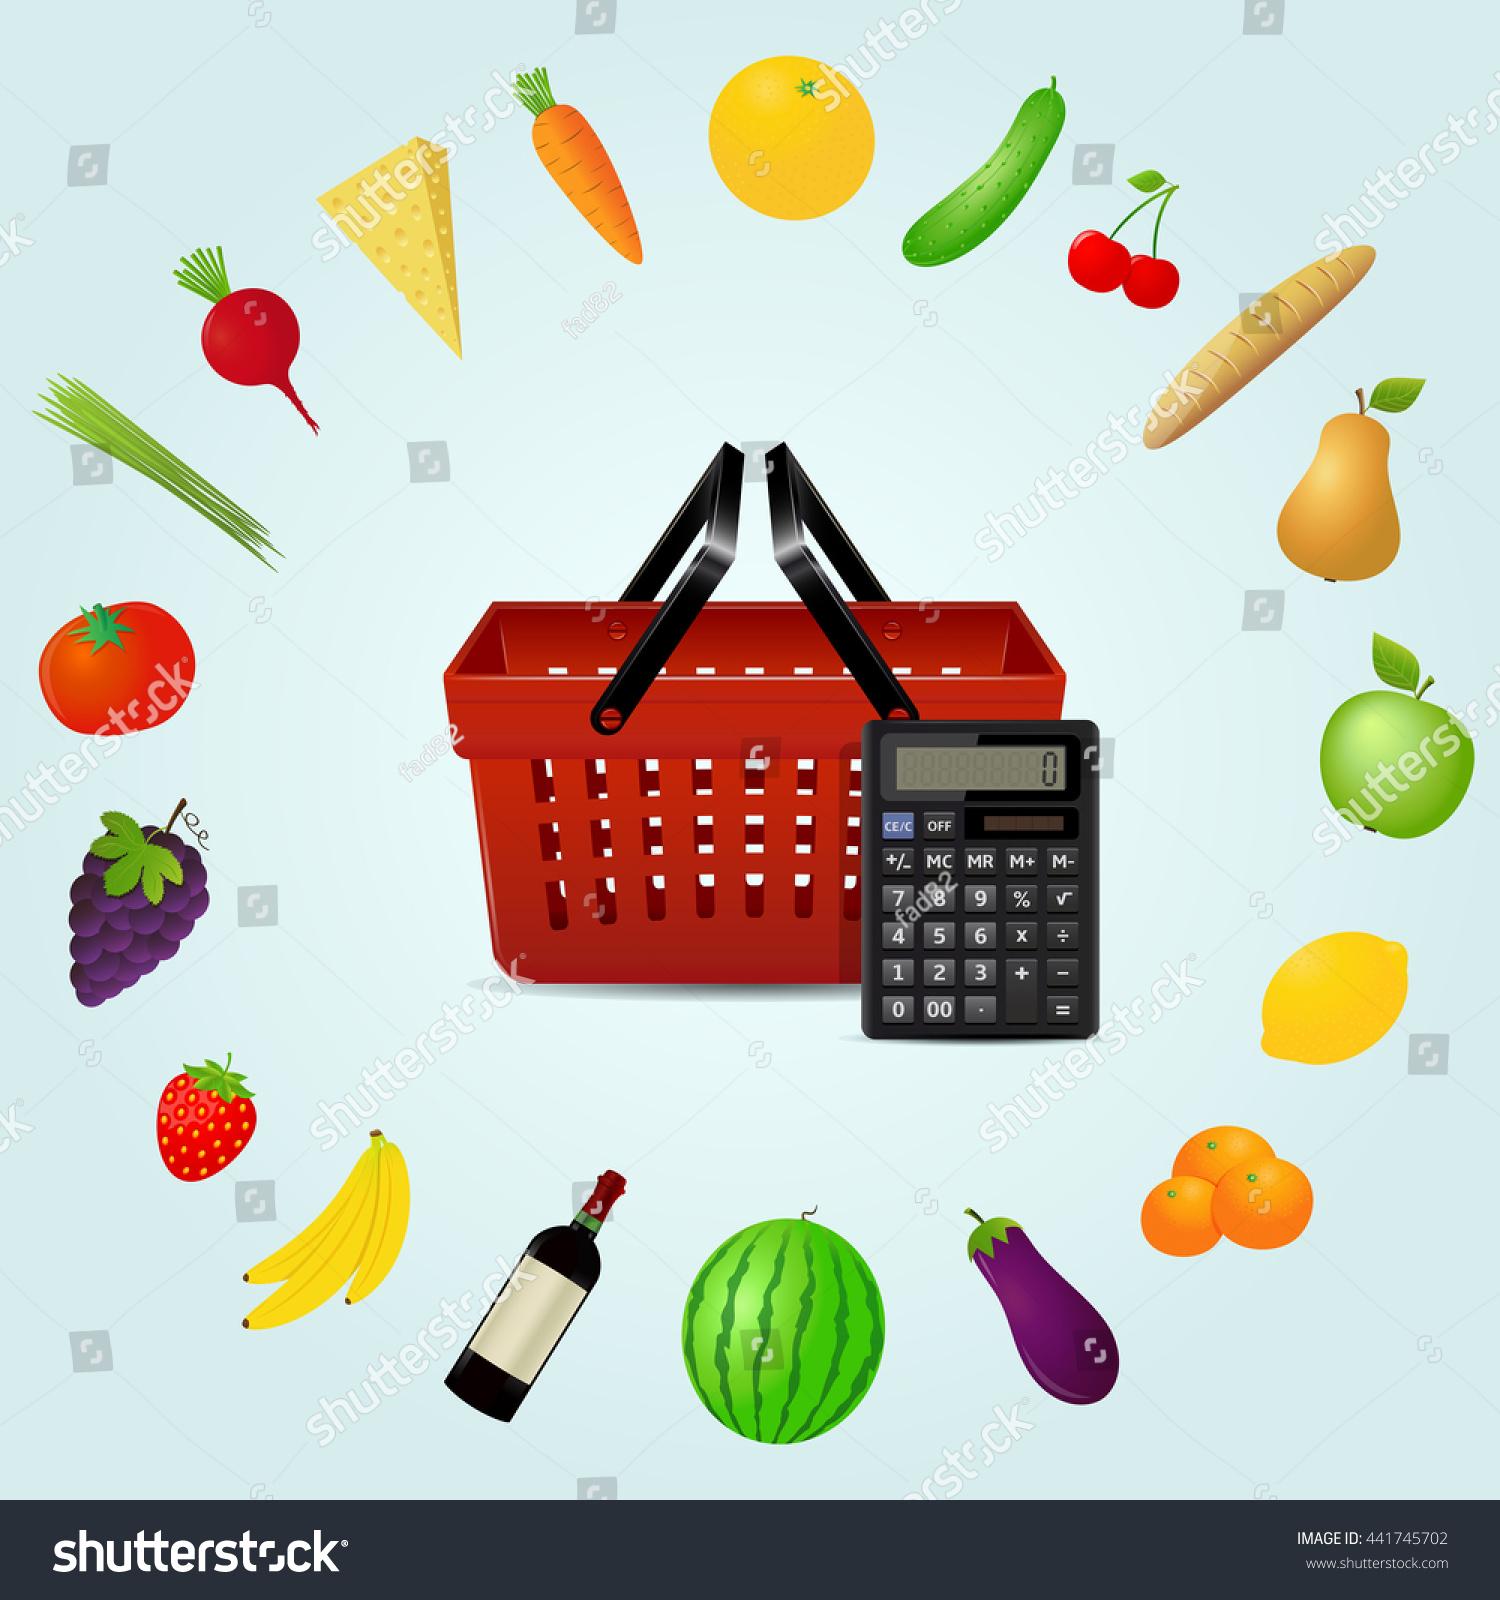 calculator shopping basket groceries stock illustration 441745702